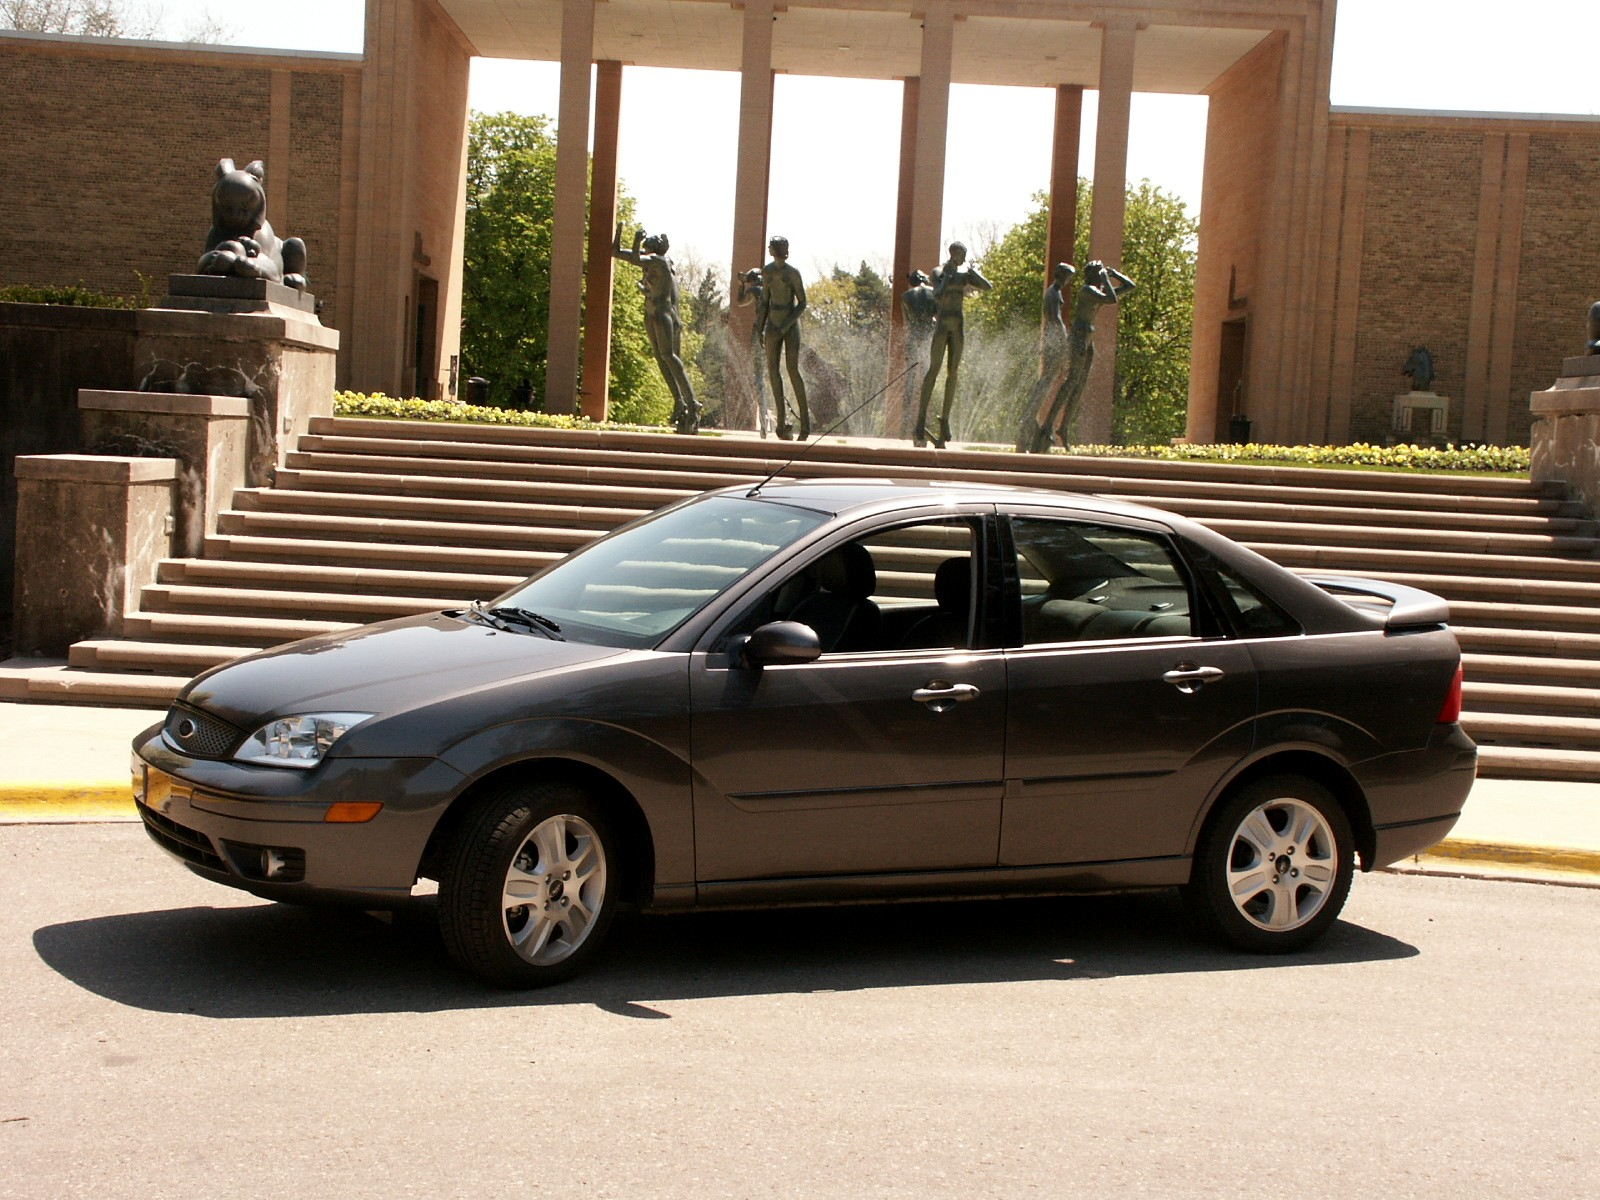 Ford Escort 2005 foto - 1